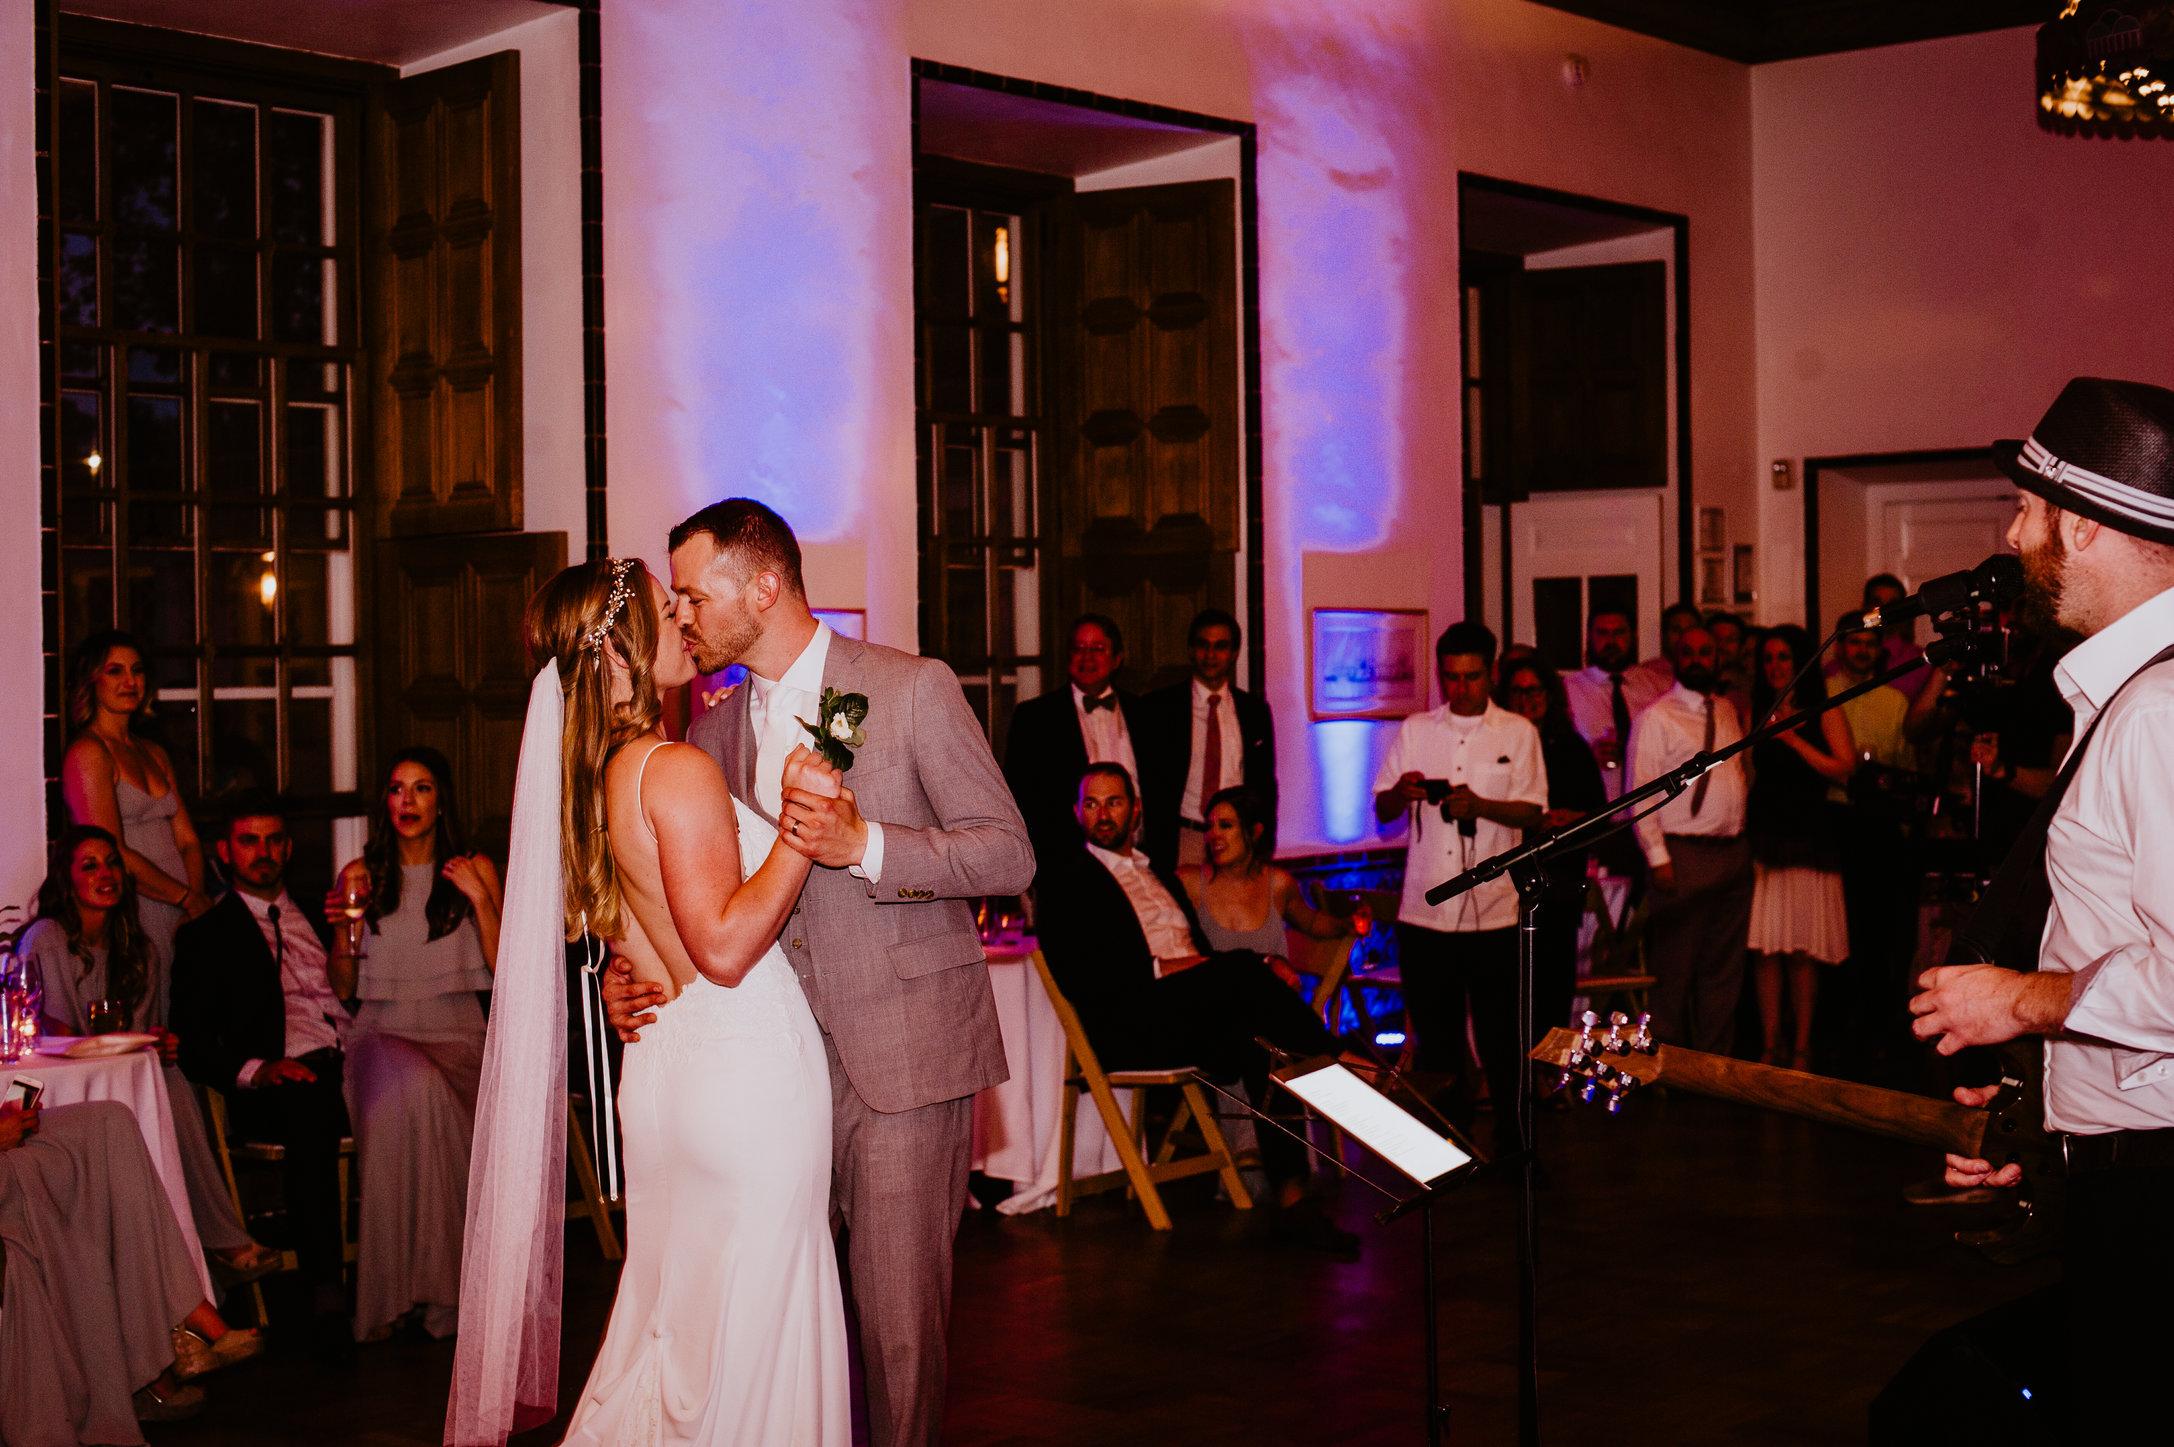 DandA-wedding-804.jpg